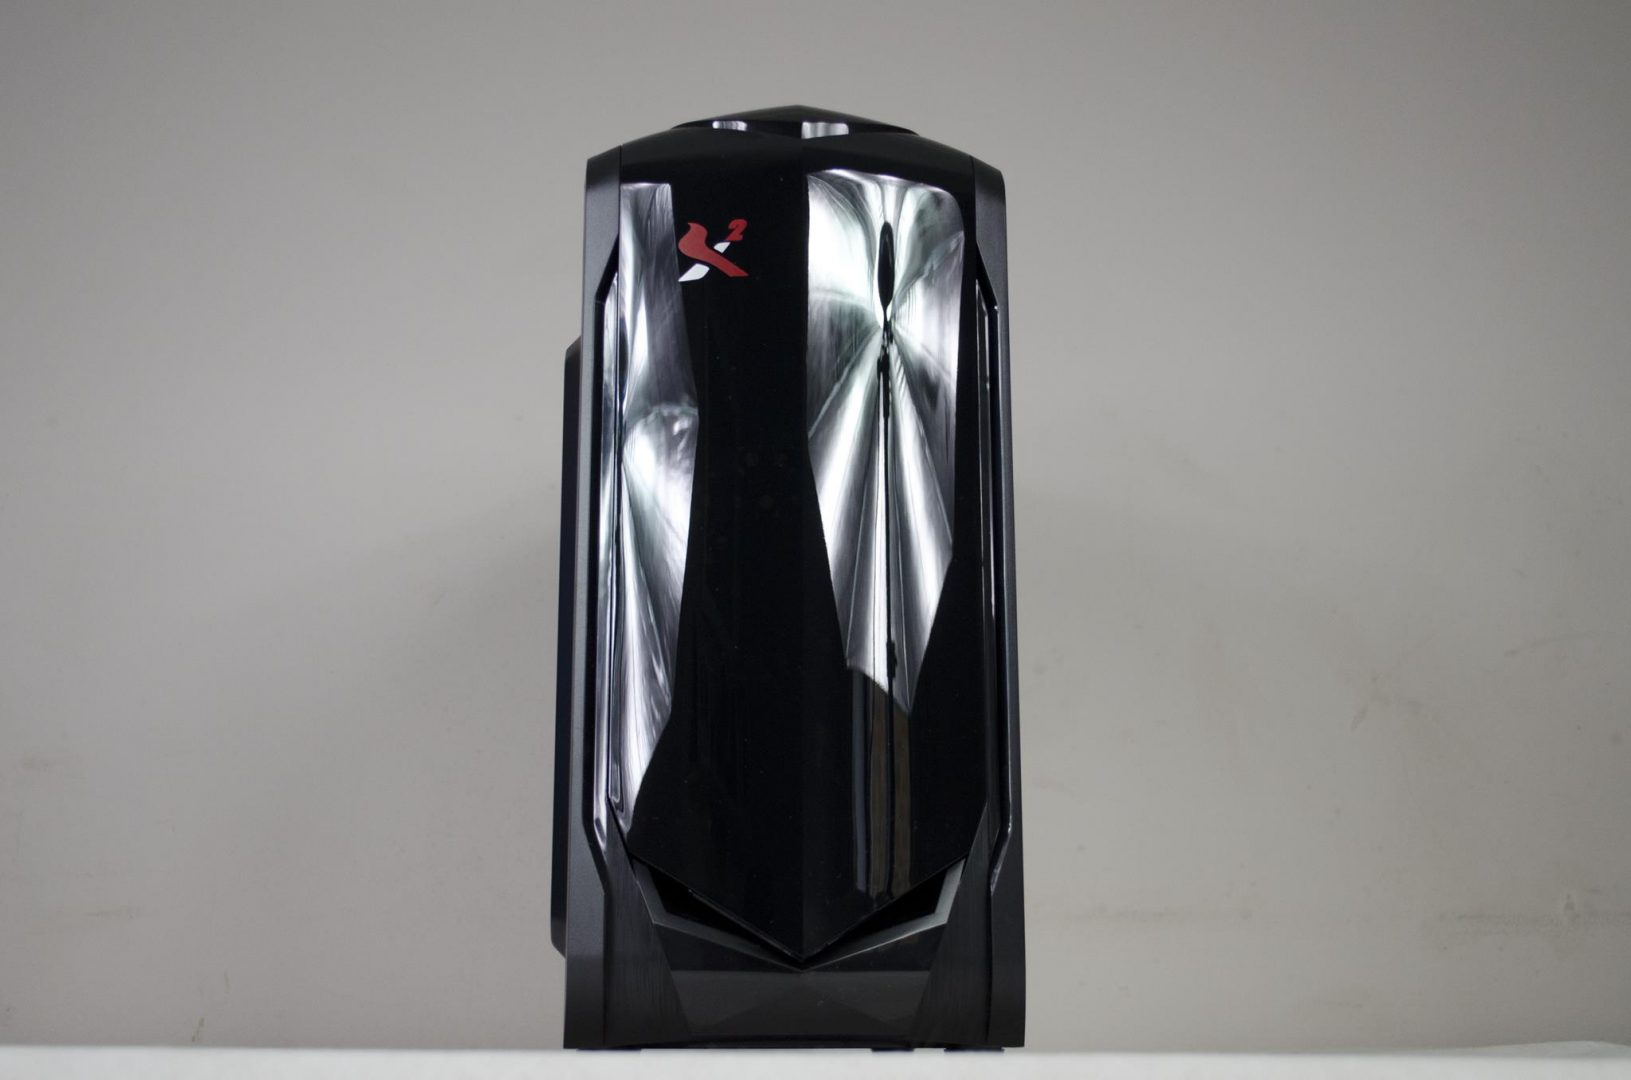 X2 SPITZER 22 PC Case Review